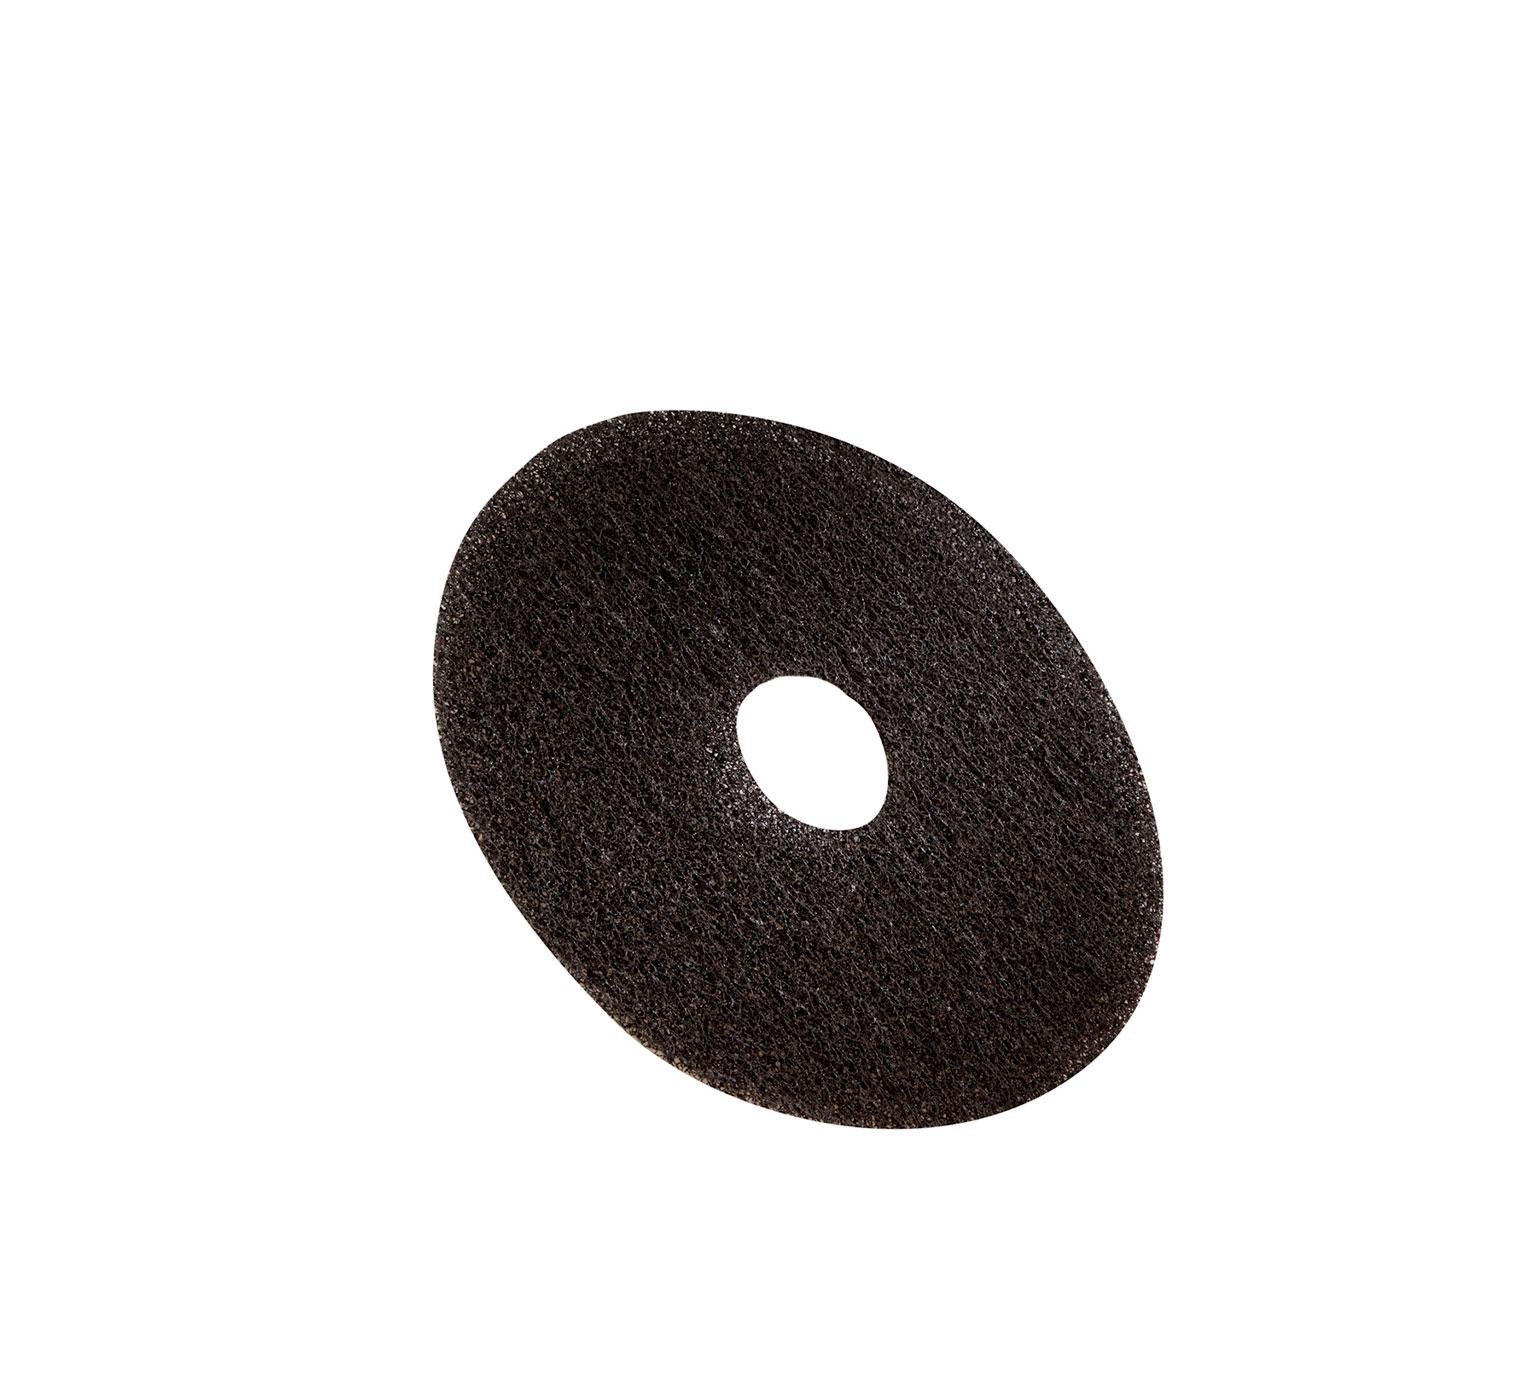 3m Black Stripping Pad 16 In 406 Mm 370092